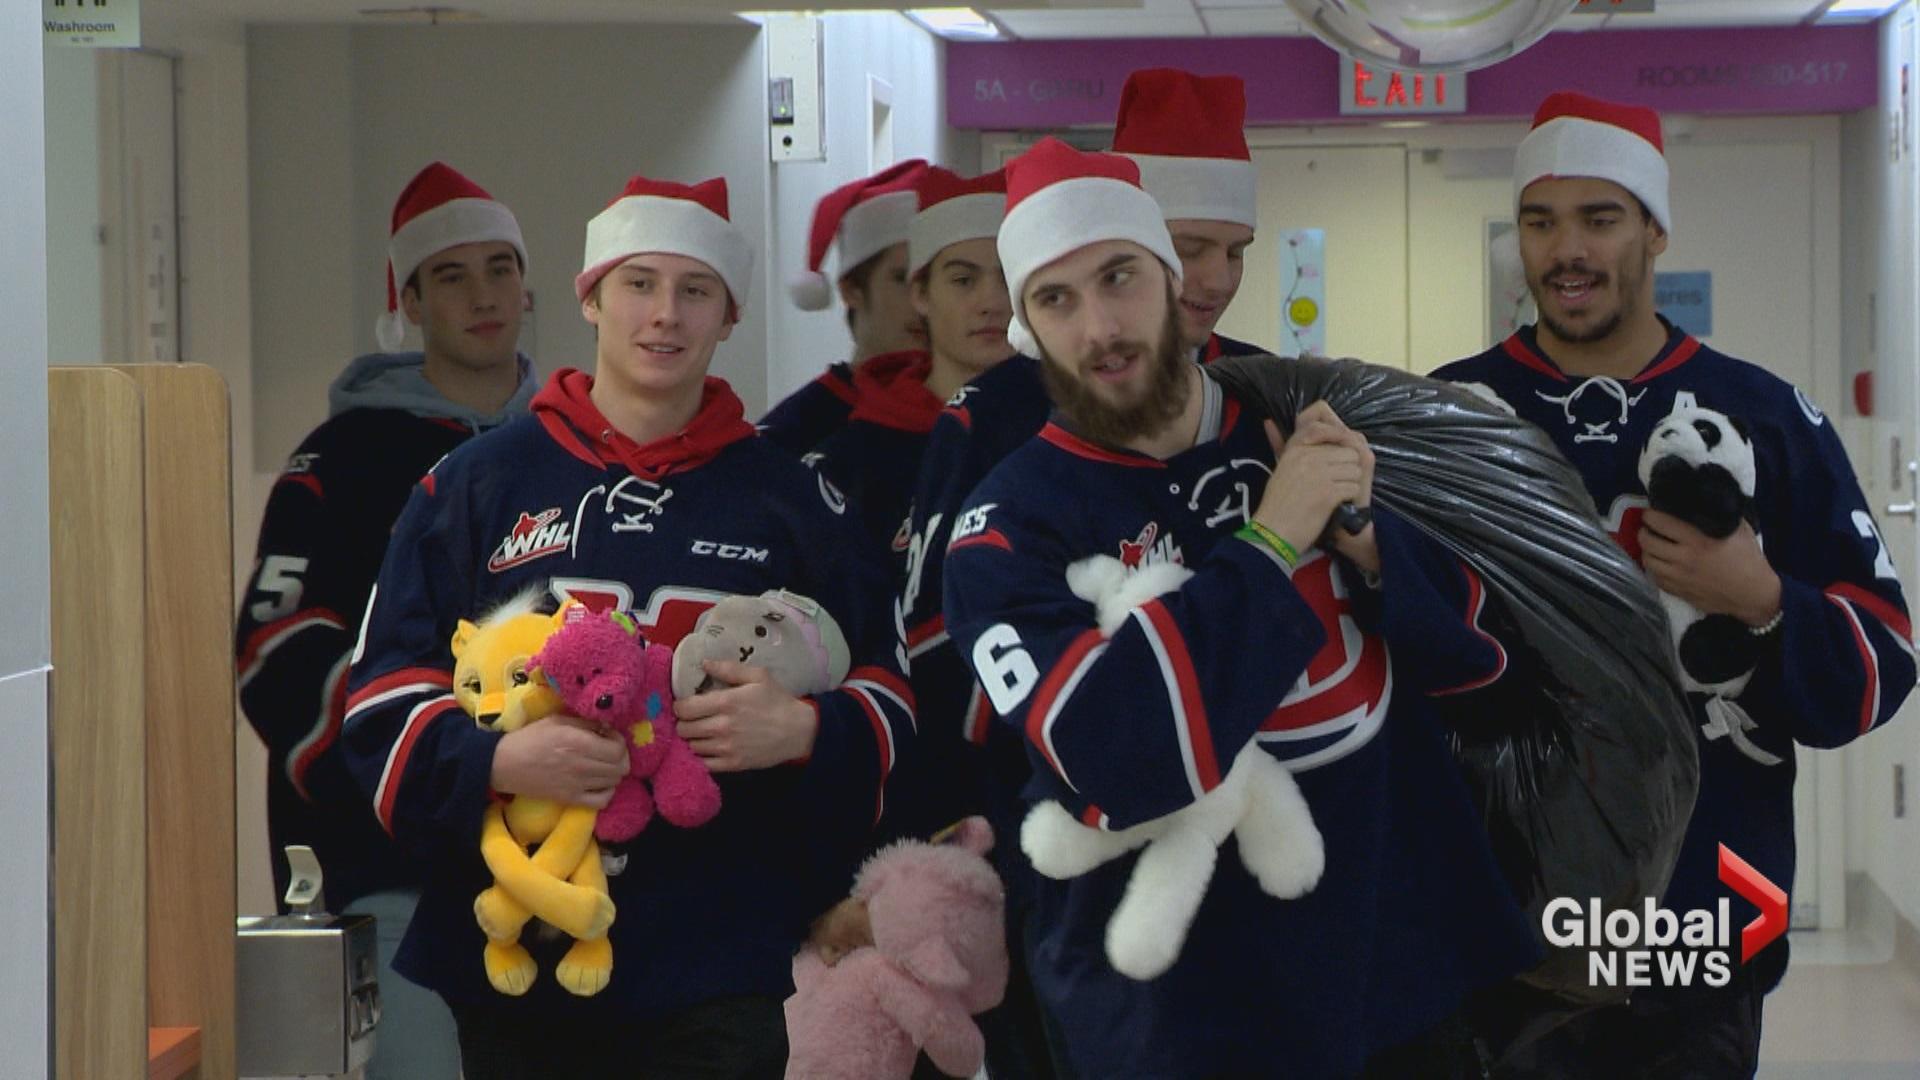 Lethbridge Hurricanes bring Teddy Bear Toss teddies to sick kids at Chinook Regional Hospital